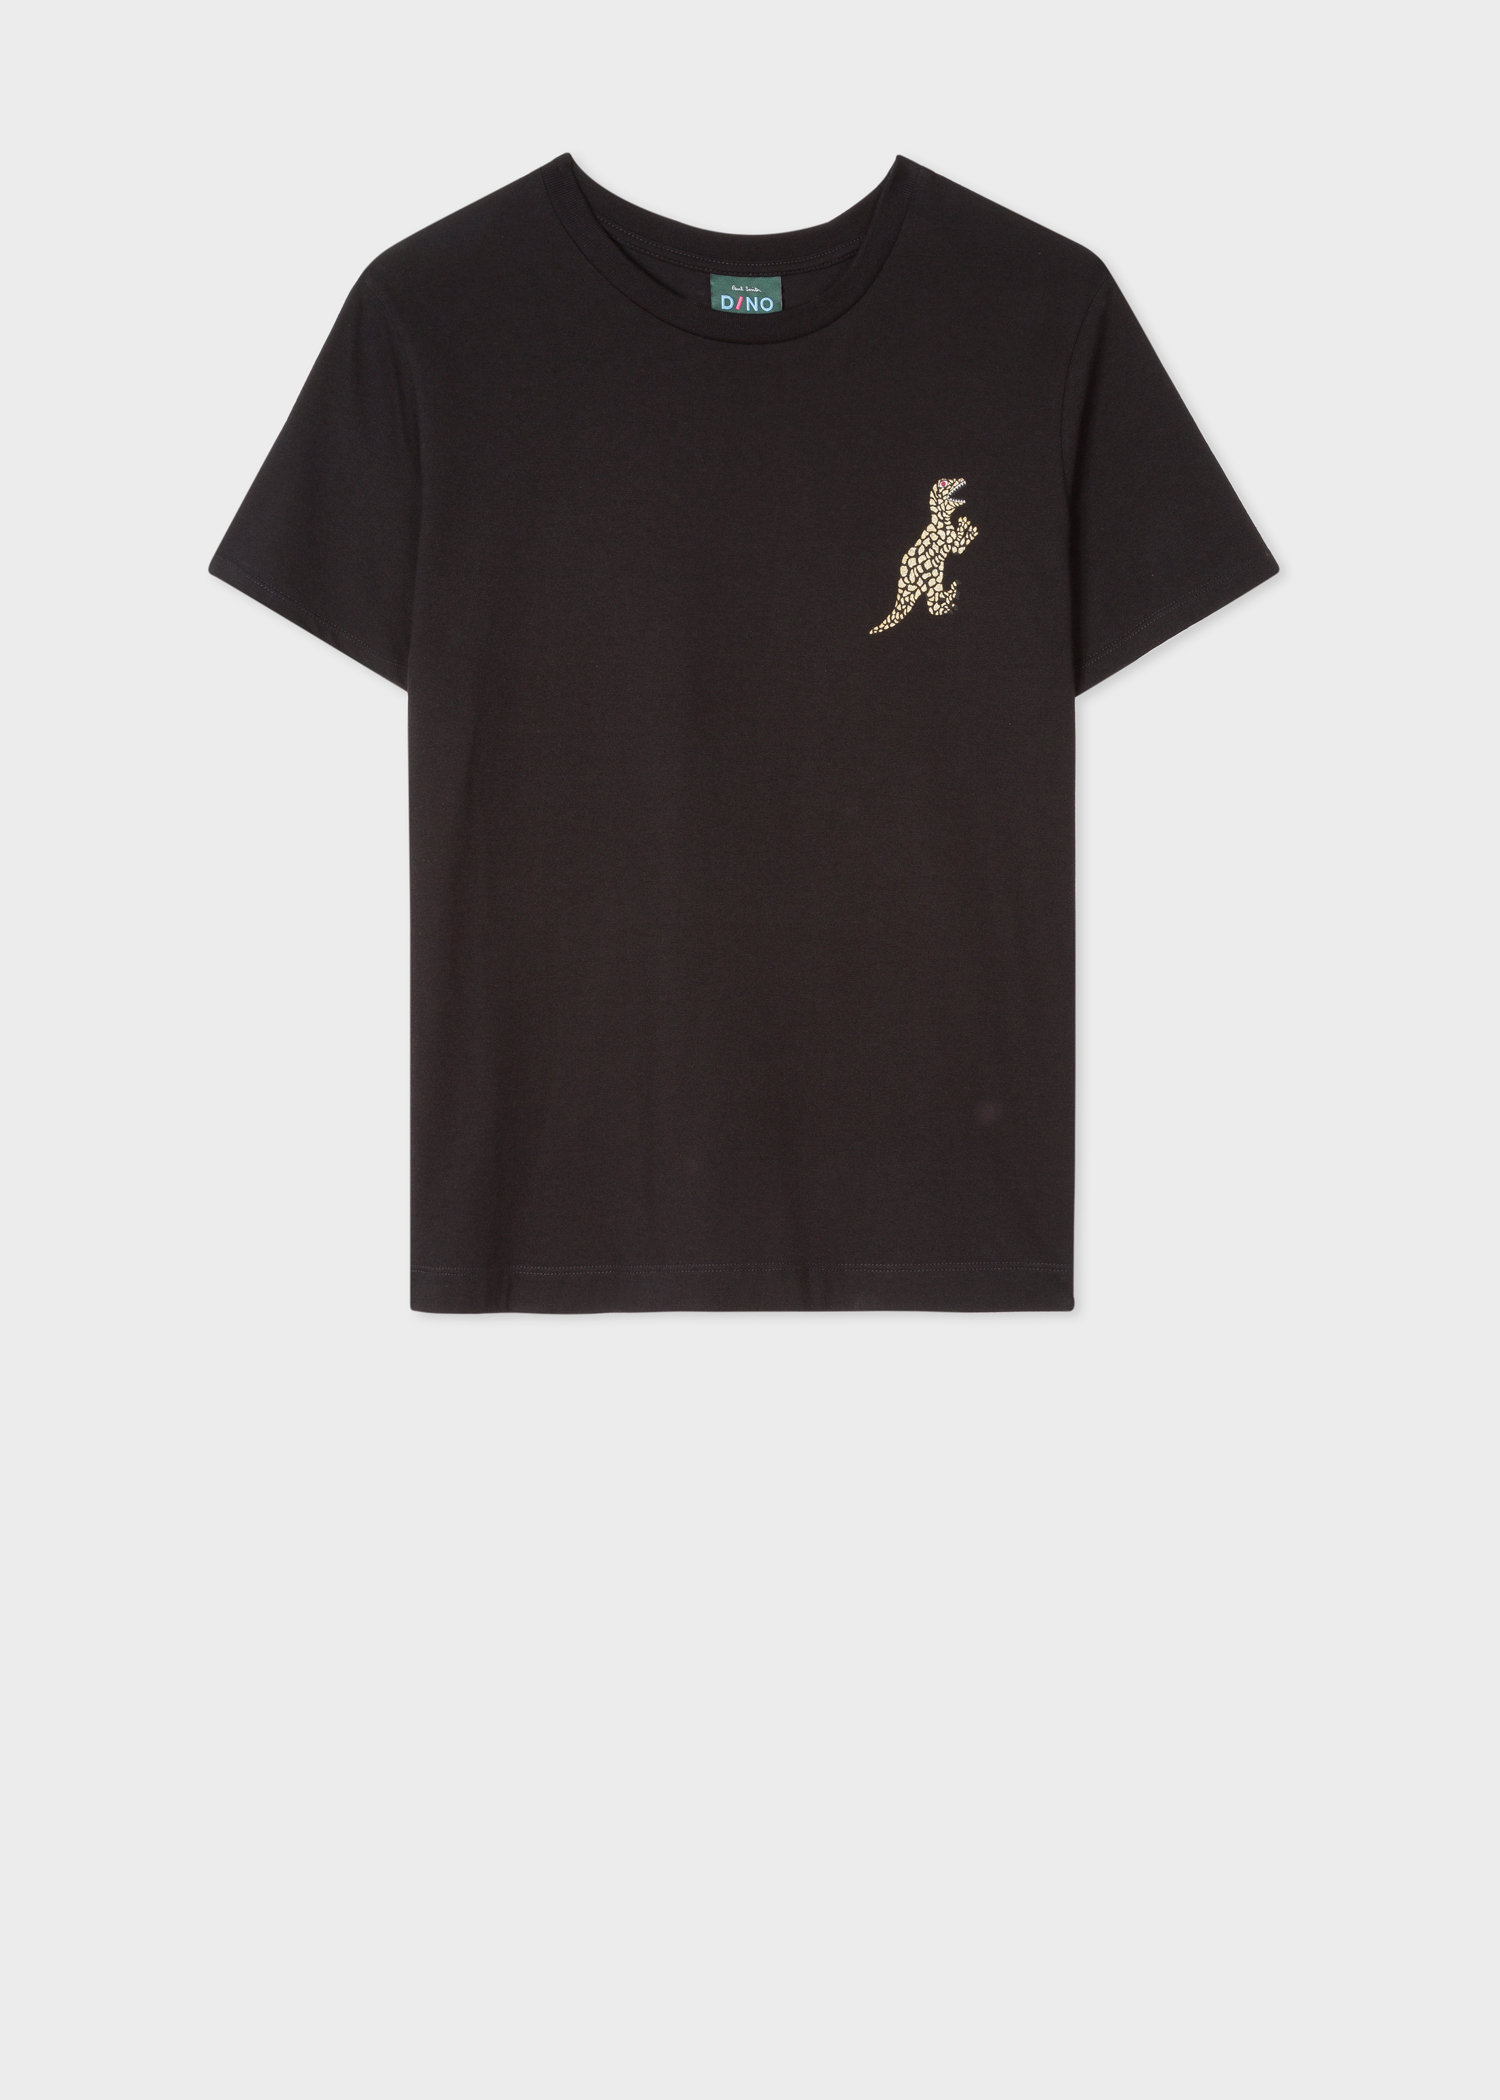 dd648c738 Front view - Women's Black Small Gold 'Dino' Print Cotton T-Shirt Paul